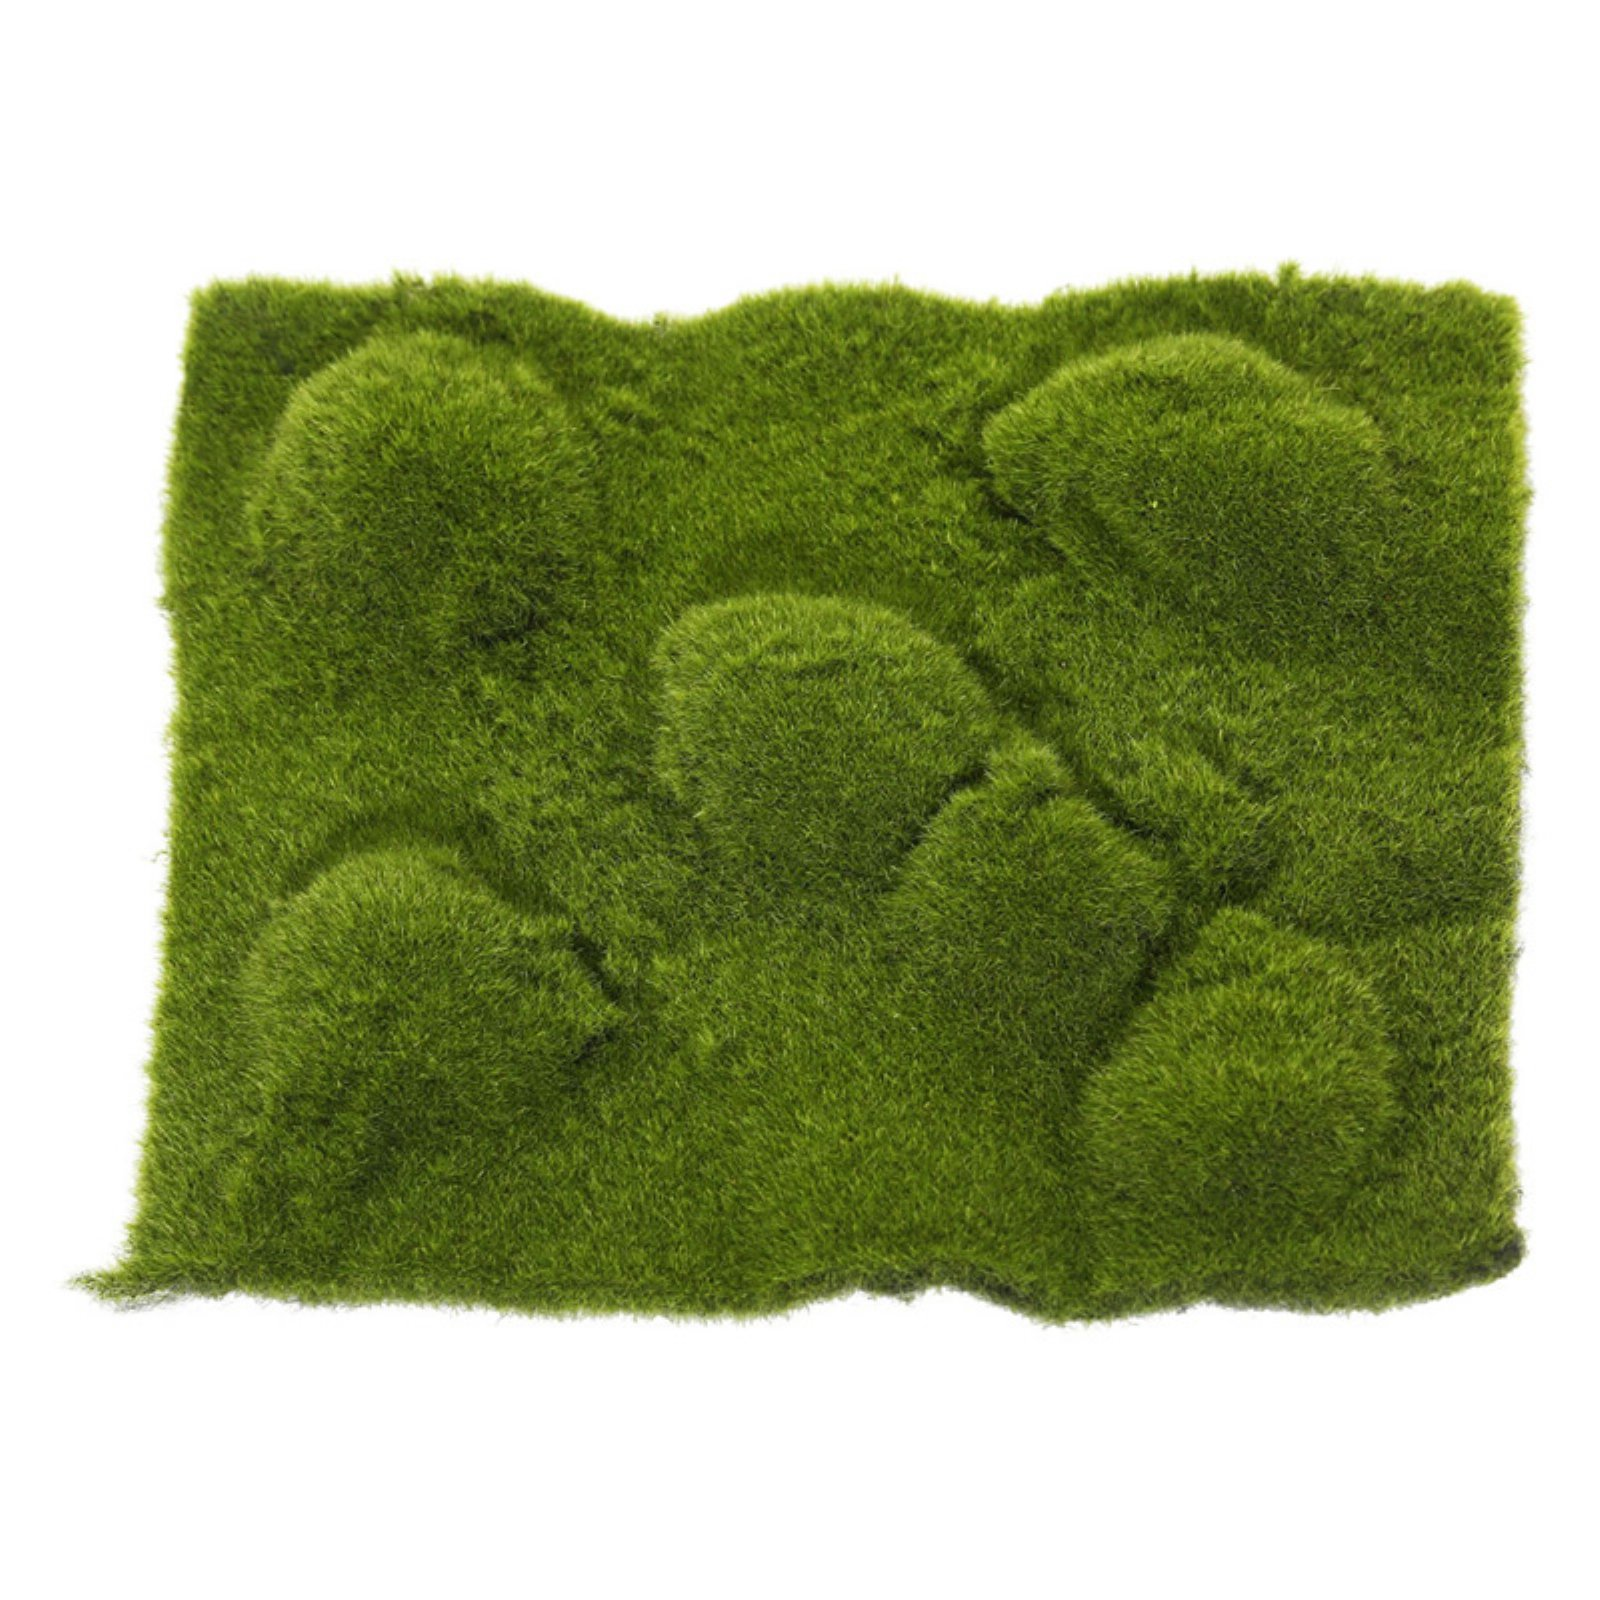 "Vickerman 12"" x 12"" Artificial Square Moss Mat"